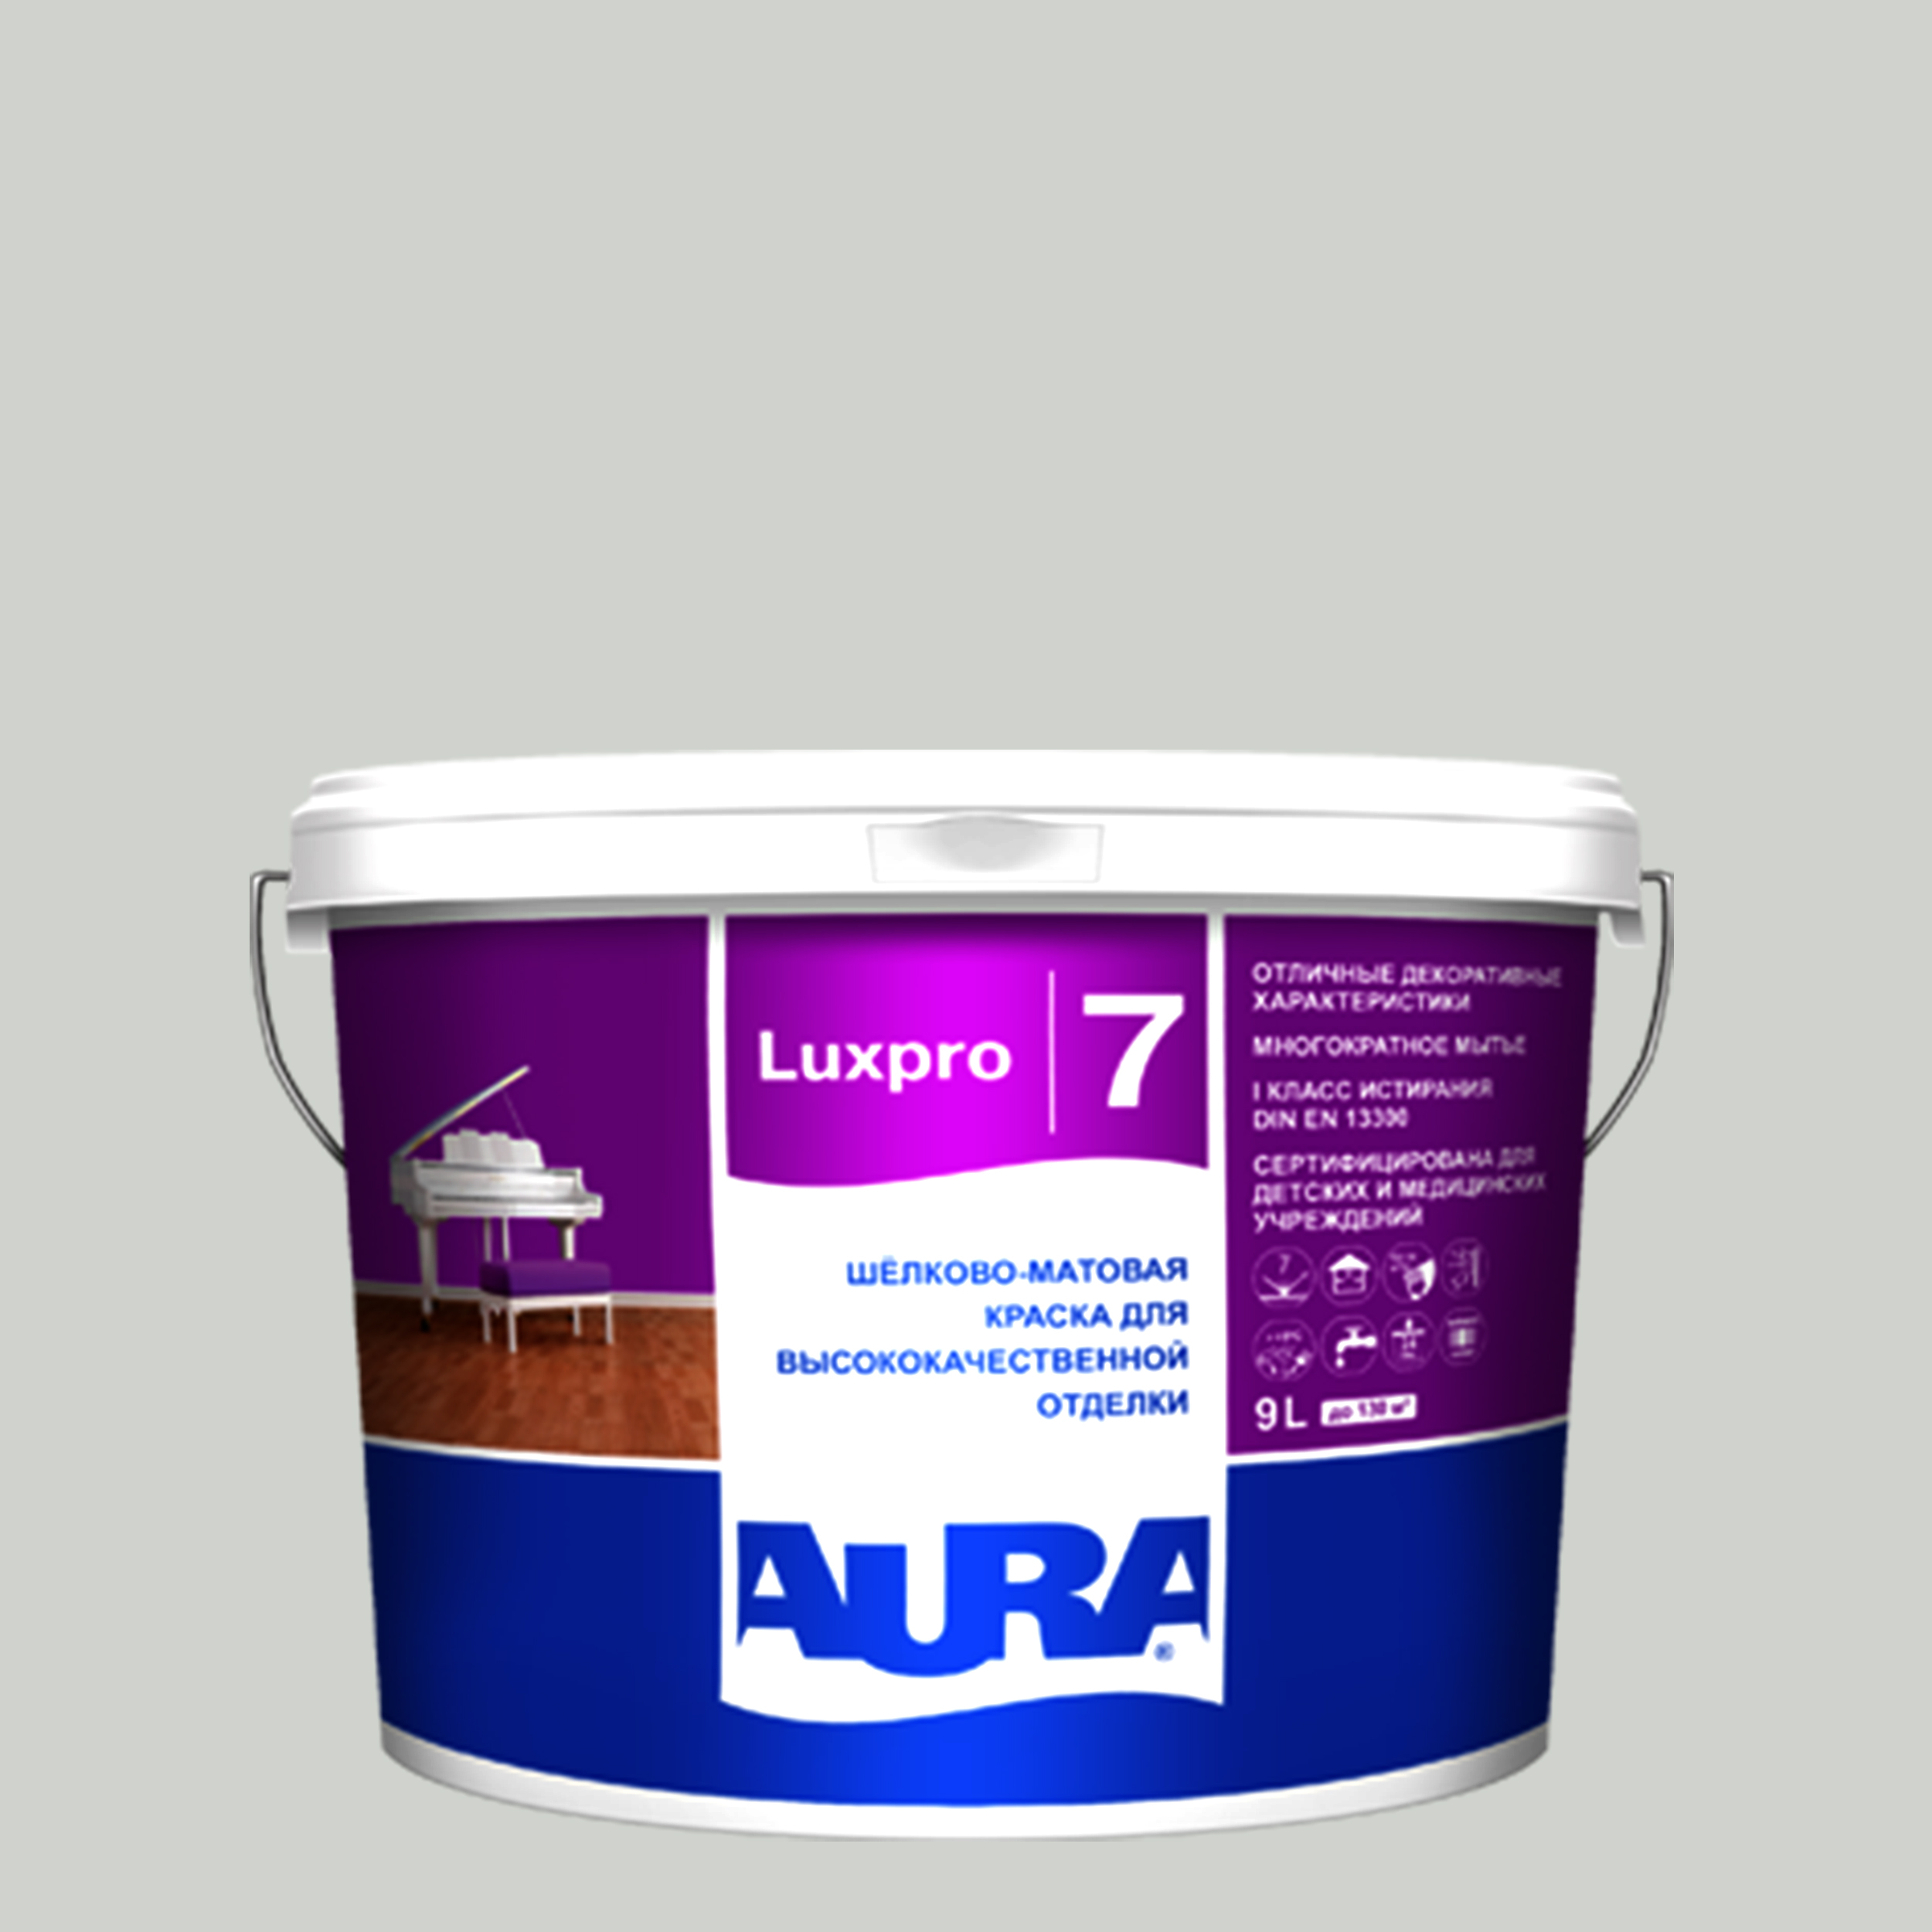 Фото 4 - Краска интерьерная, Aura LuxPRO 7, RAL 6008, 11 кг.